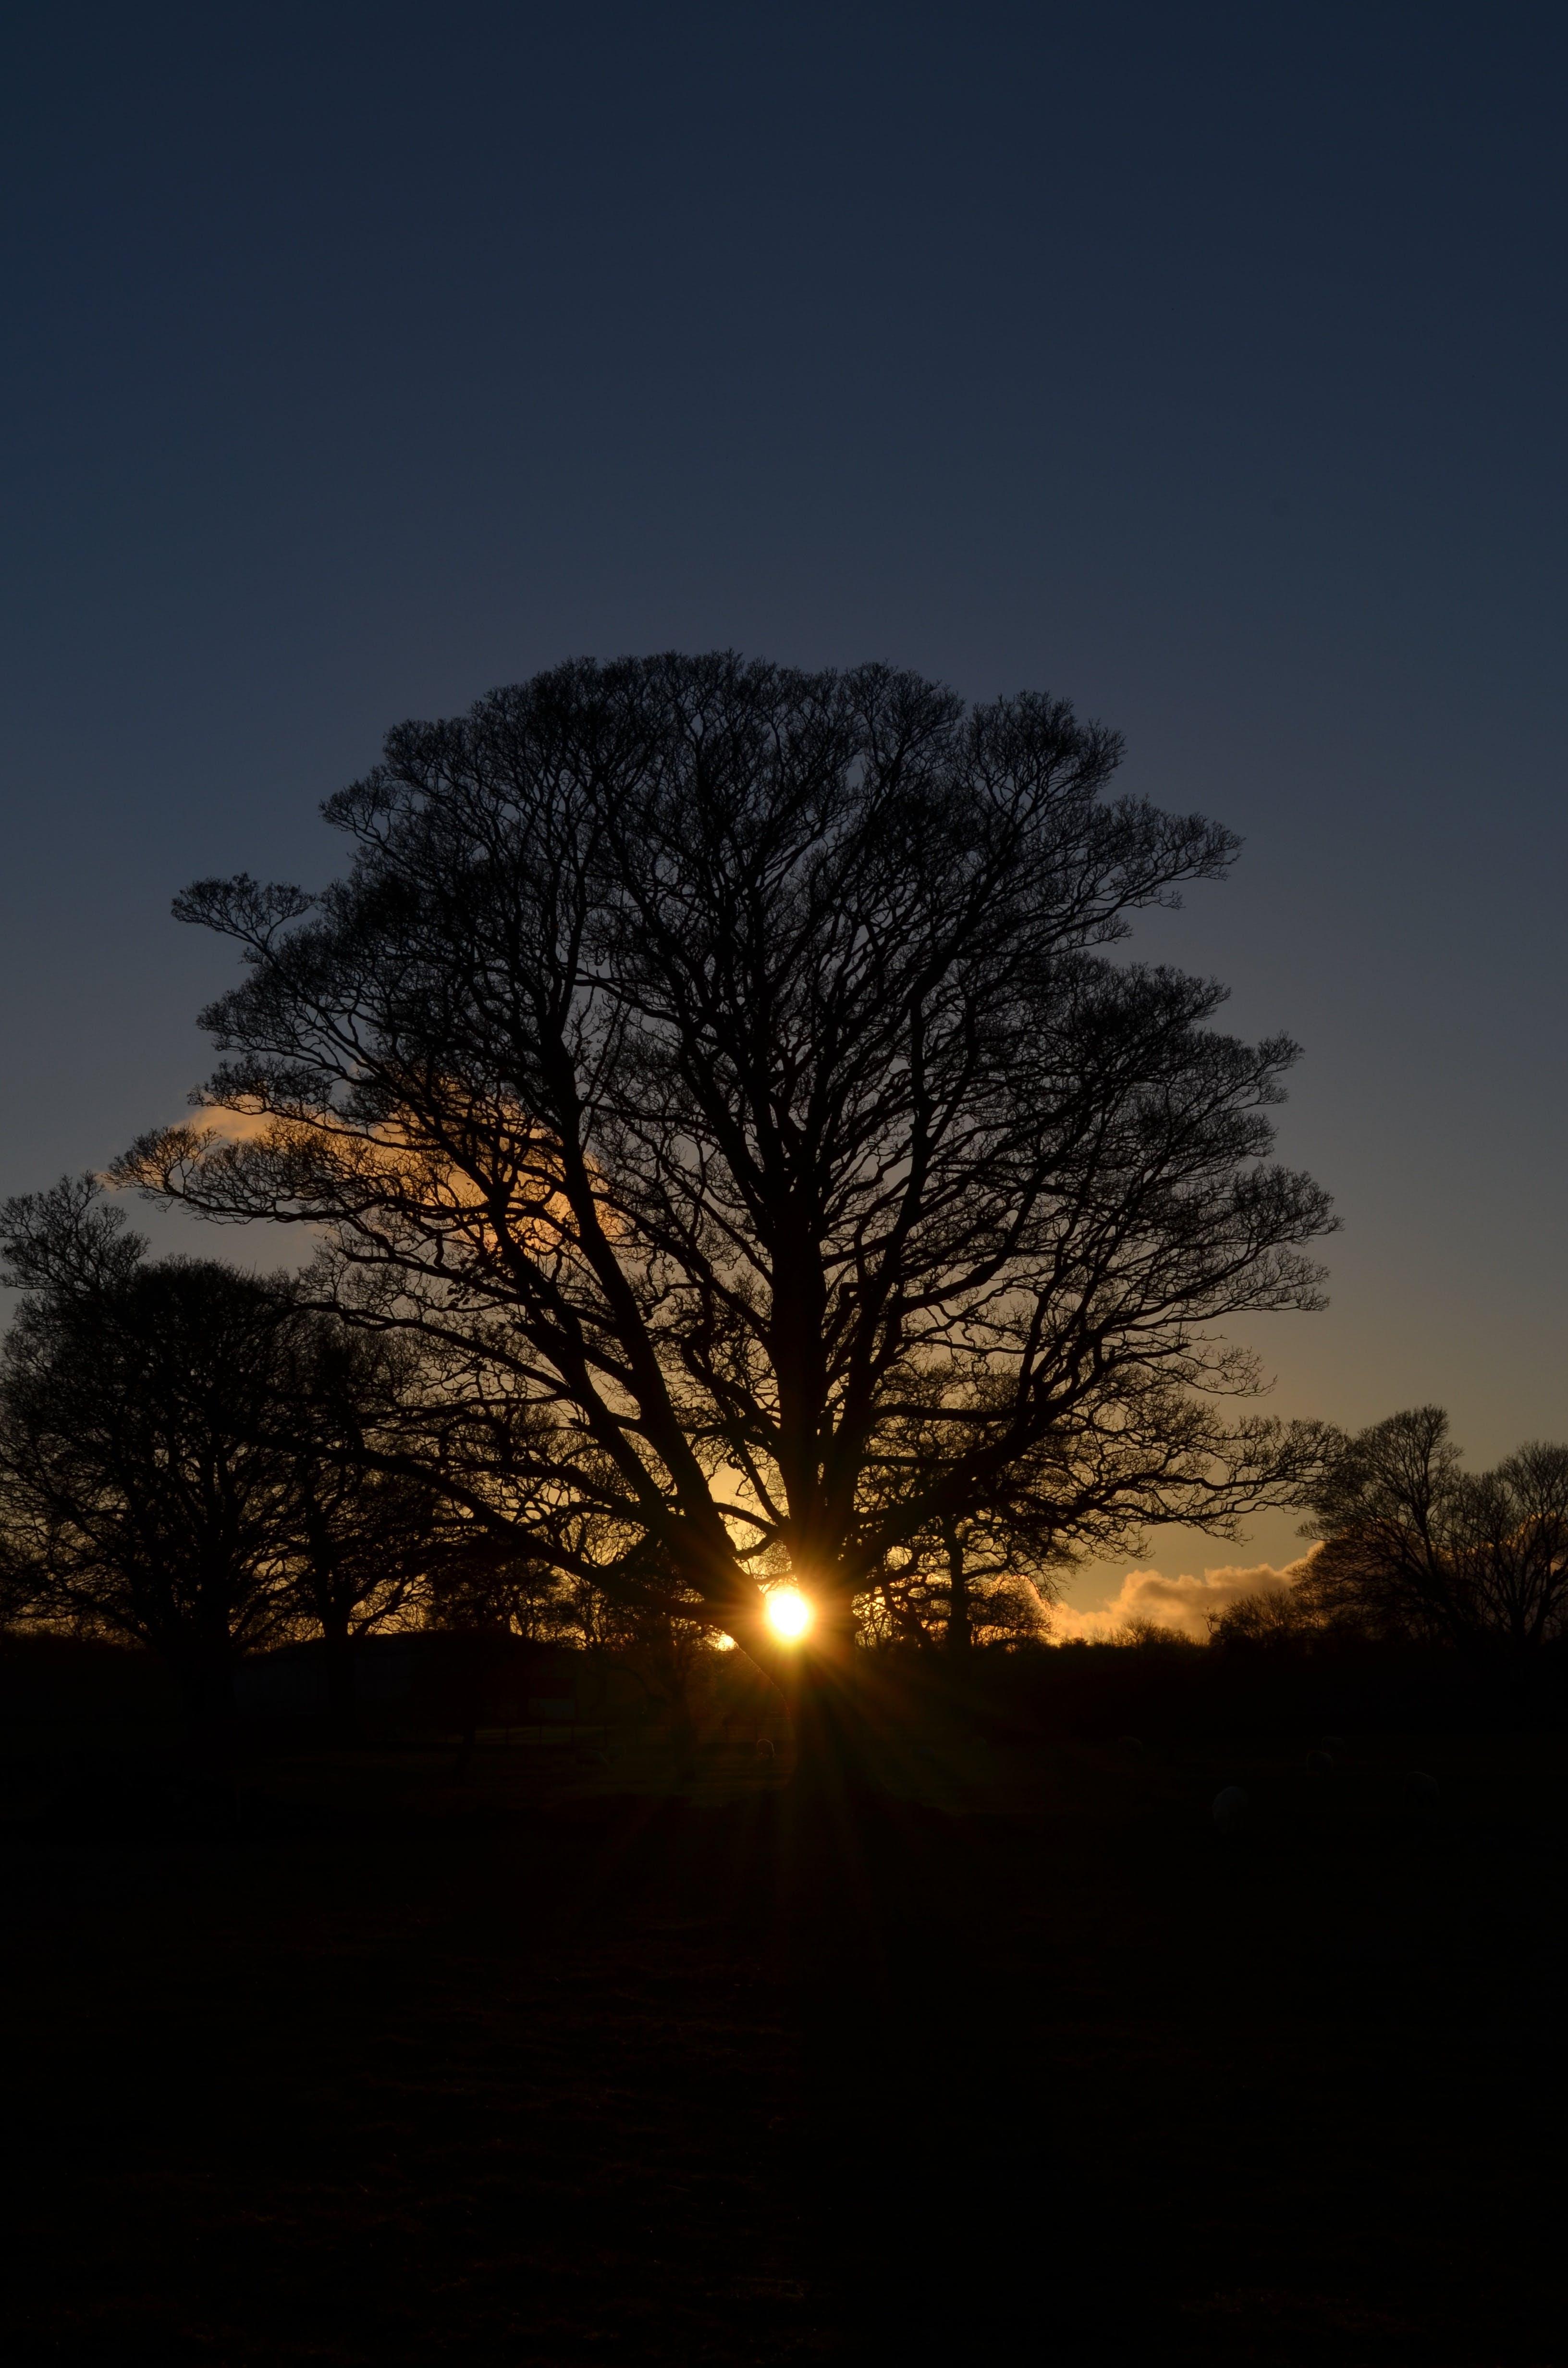 iphoneの壁紙, サムソンの壁紙, 夜明け, 太陽の無料の写真素材